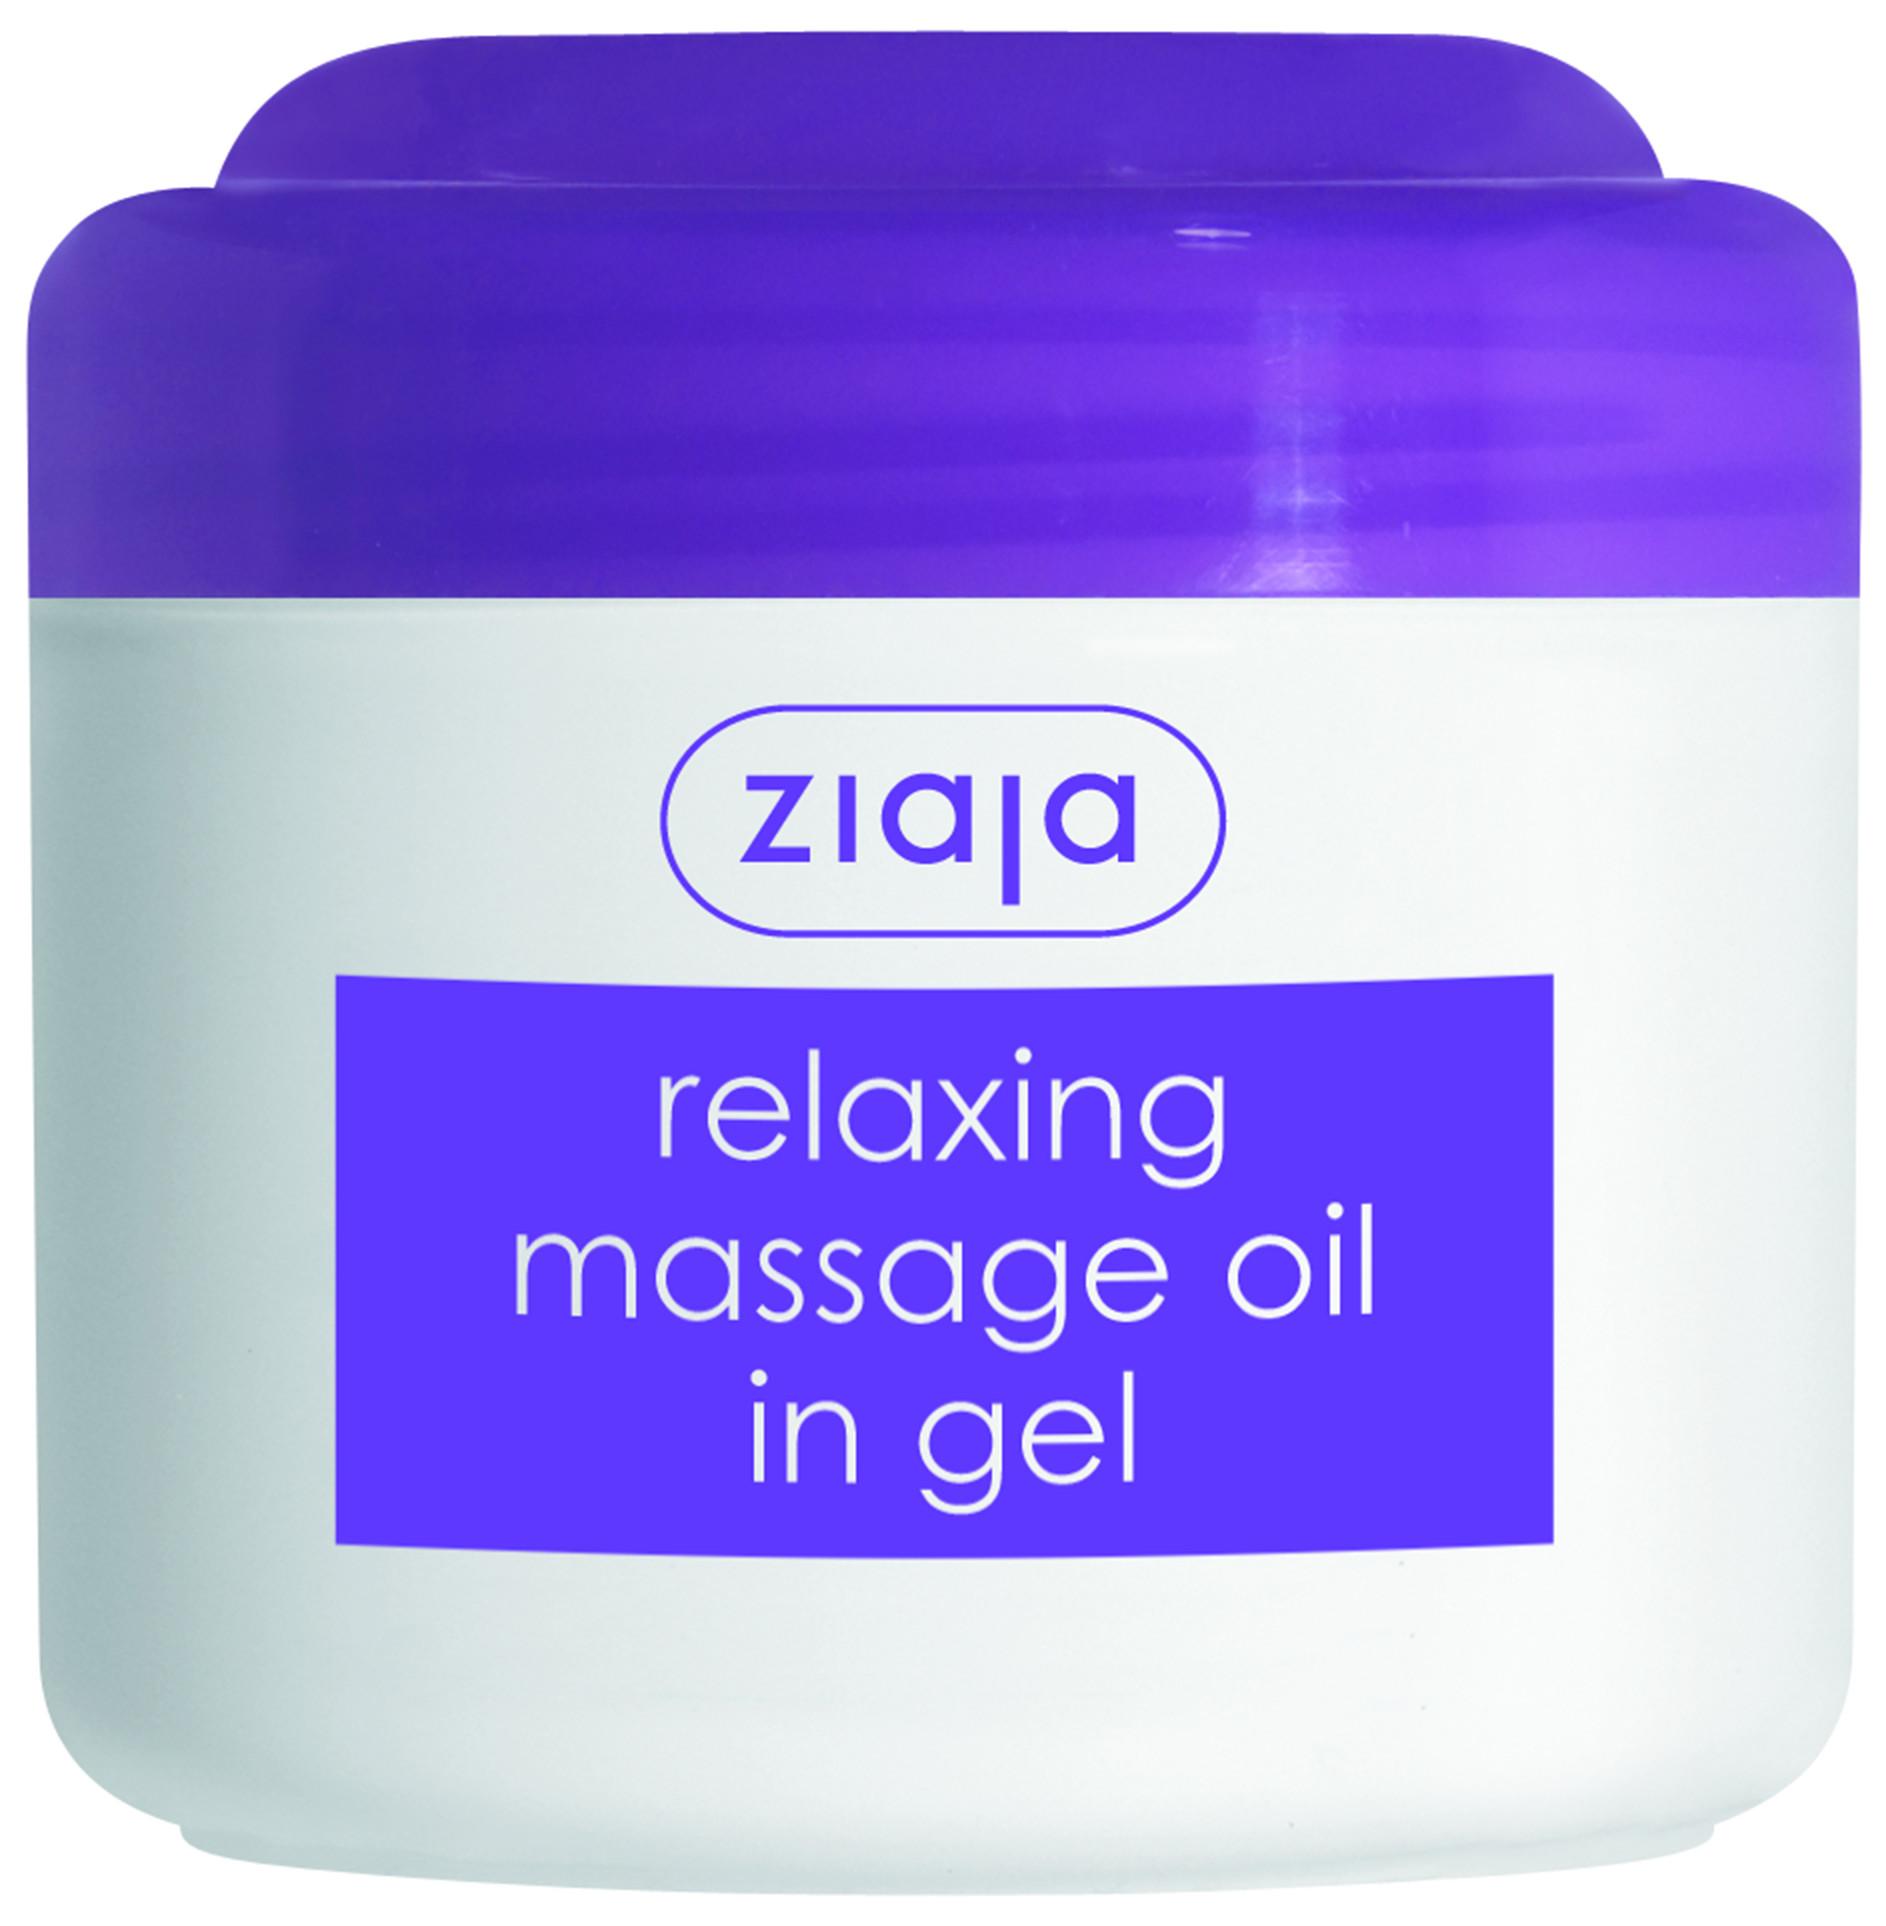 ЖАЯ Релаксиращо масажно олио в гел форма 180мл   ZIAJA Relaxing massage oil in gel 180ml